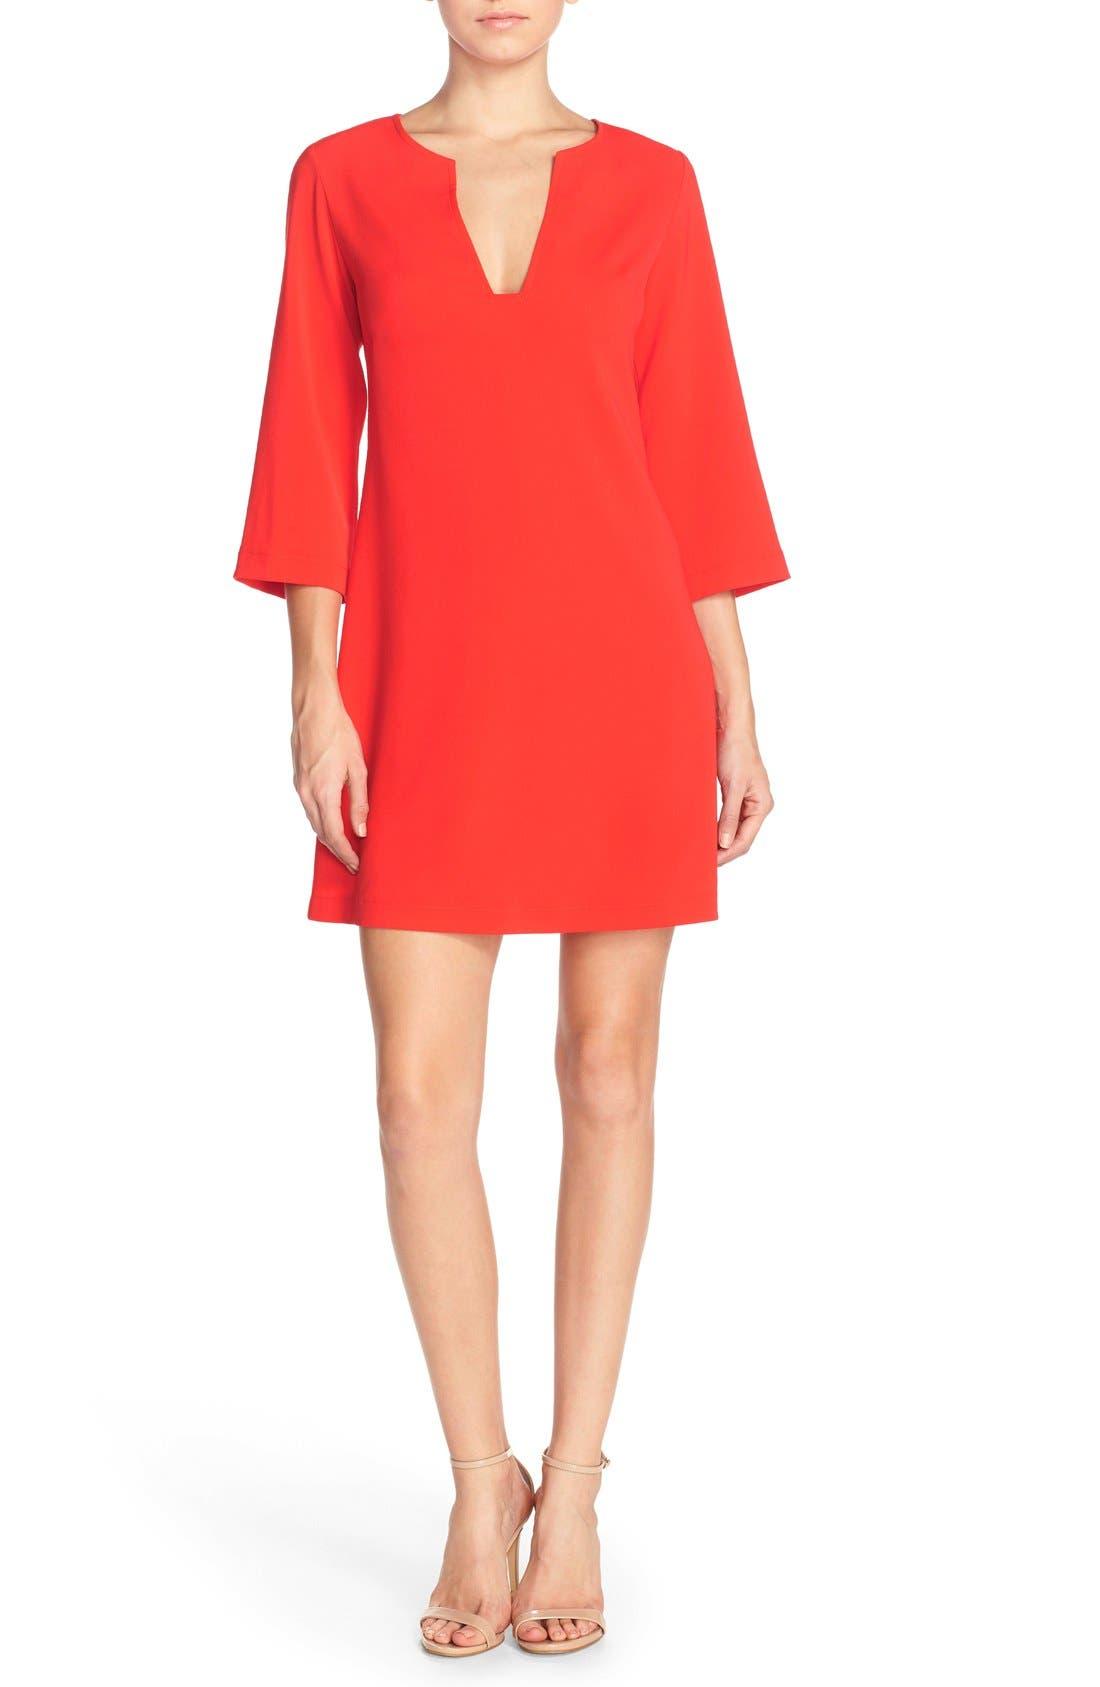 Alternate Image 1 Selected - Amanda Uprichard Stretch Crepe A-Line Dress